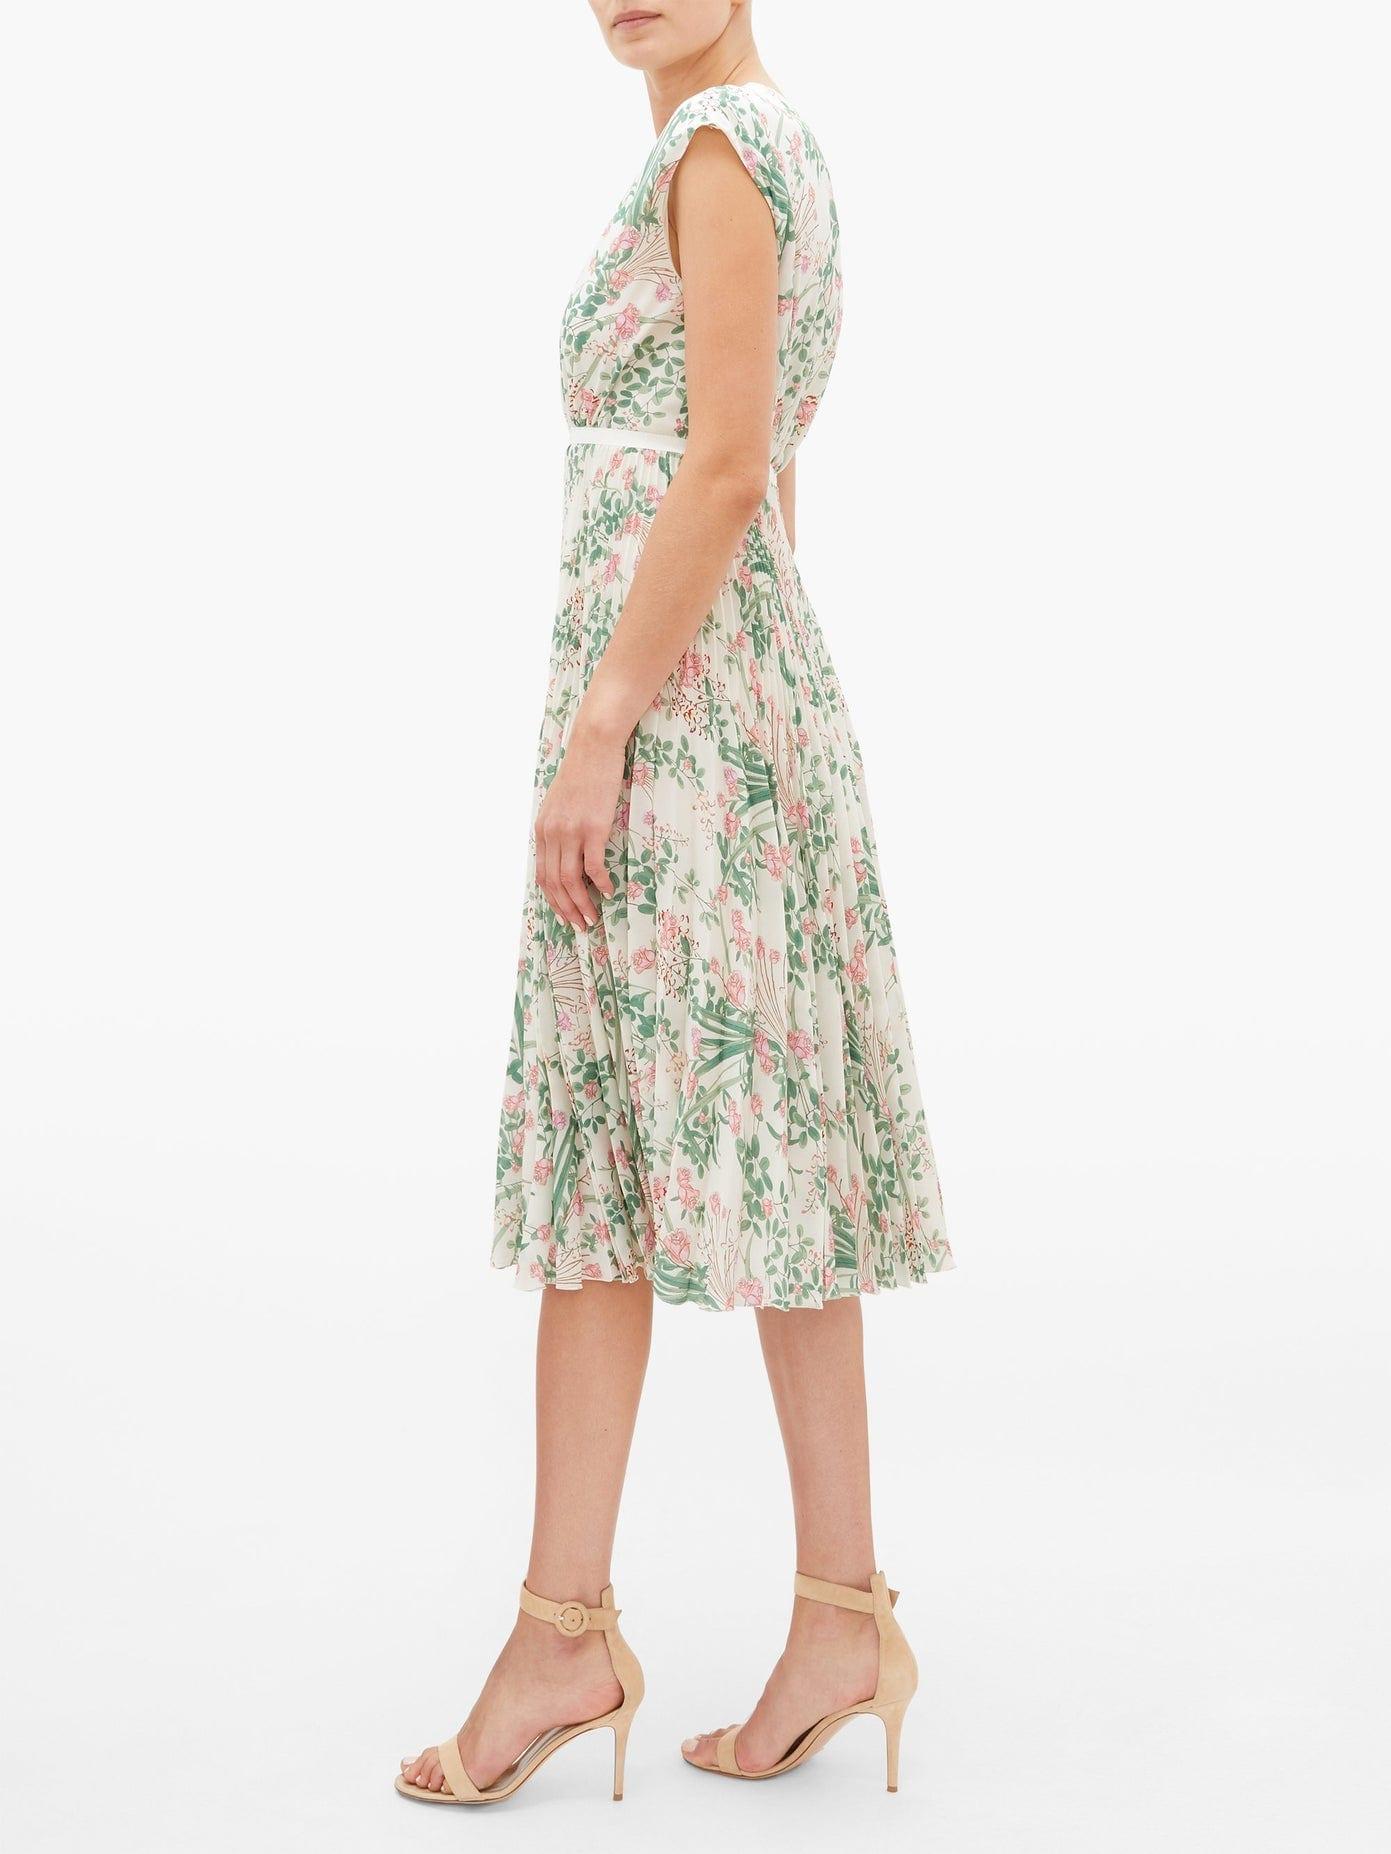 GIAMBATTISTA VALLI Floral-Print Pleated Silk-Crepe Dress